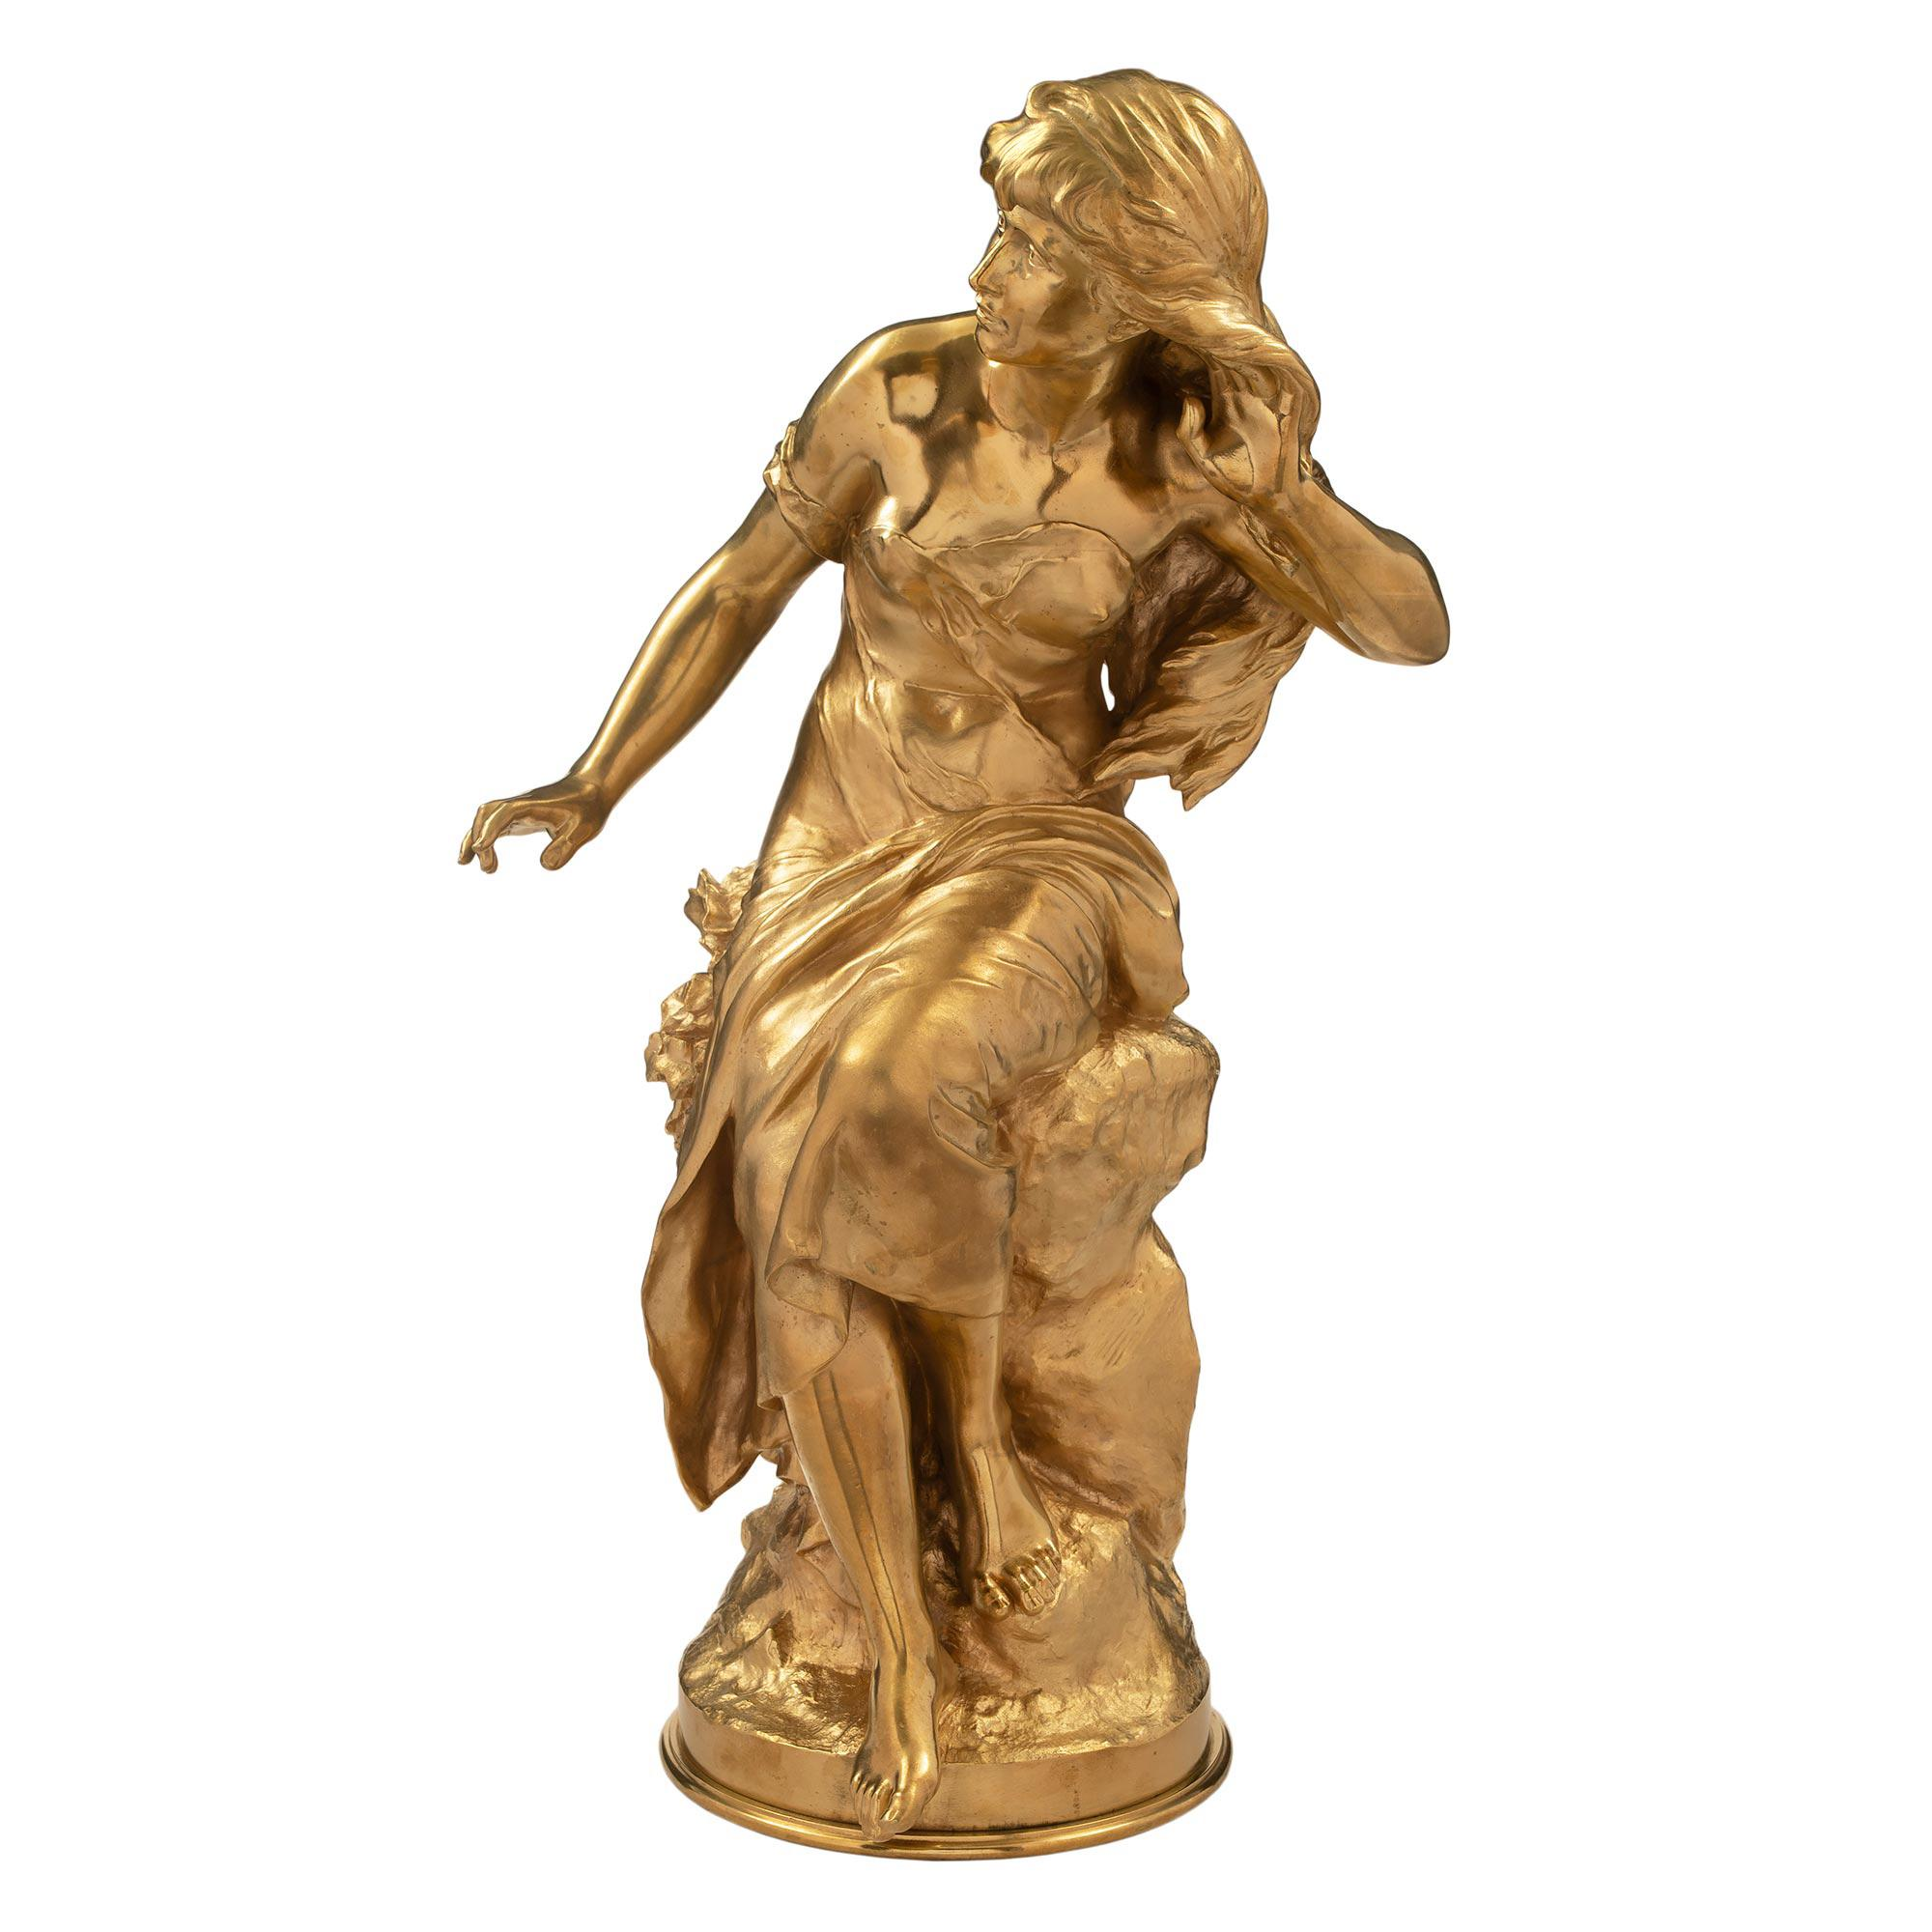 French 19th Century Louis XVI St. Ormolu Statue, by Mathurin Moreau